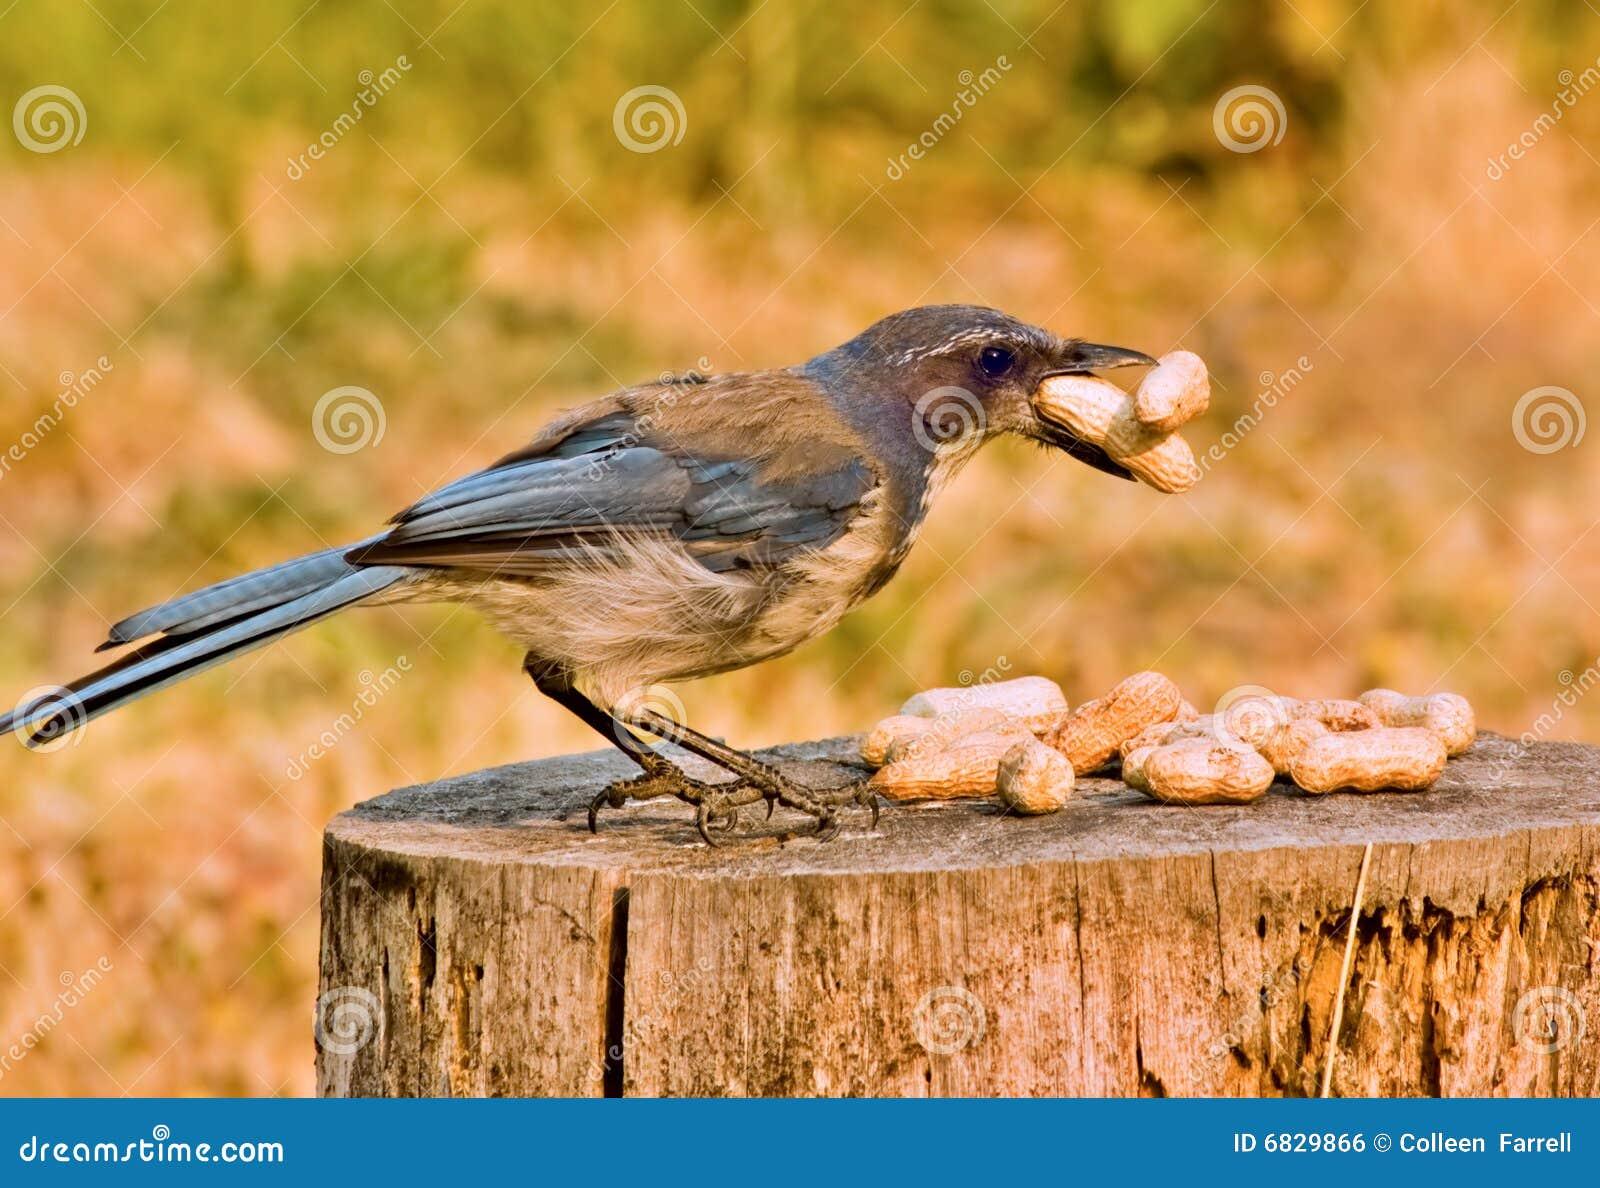 Scrub Jay with peanuts